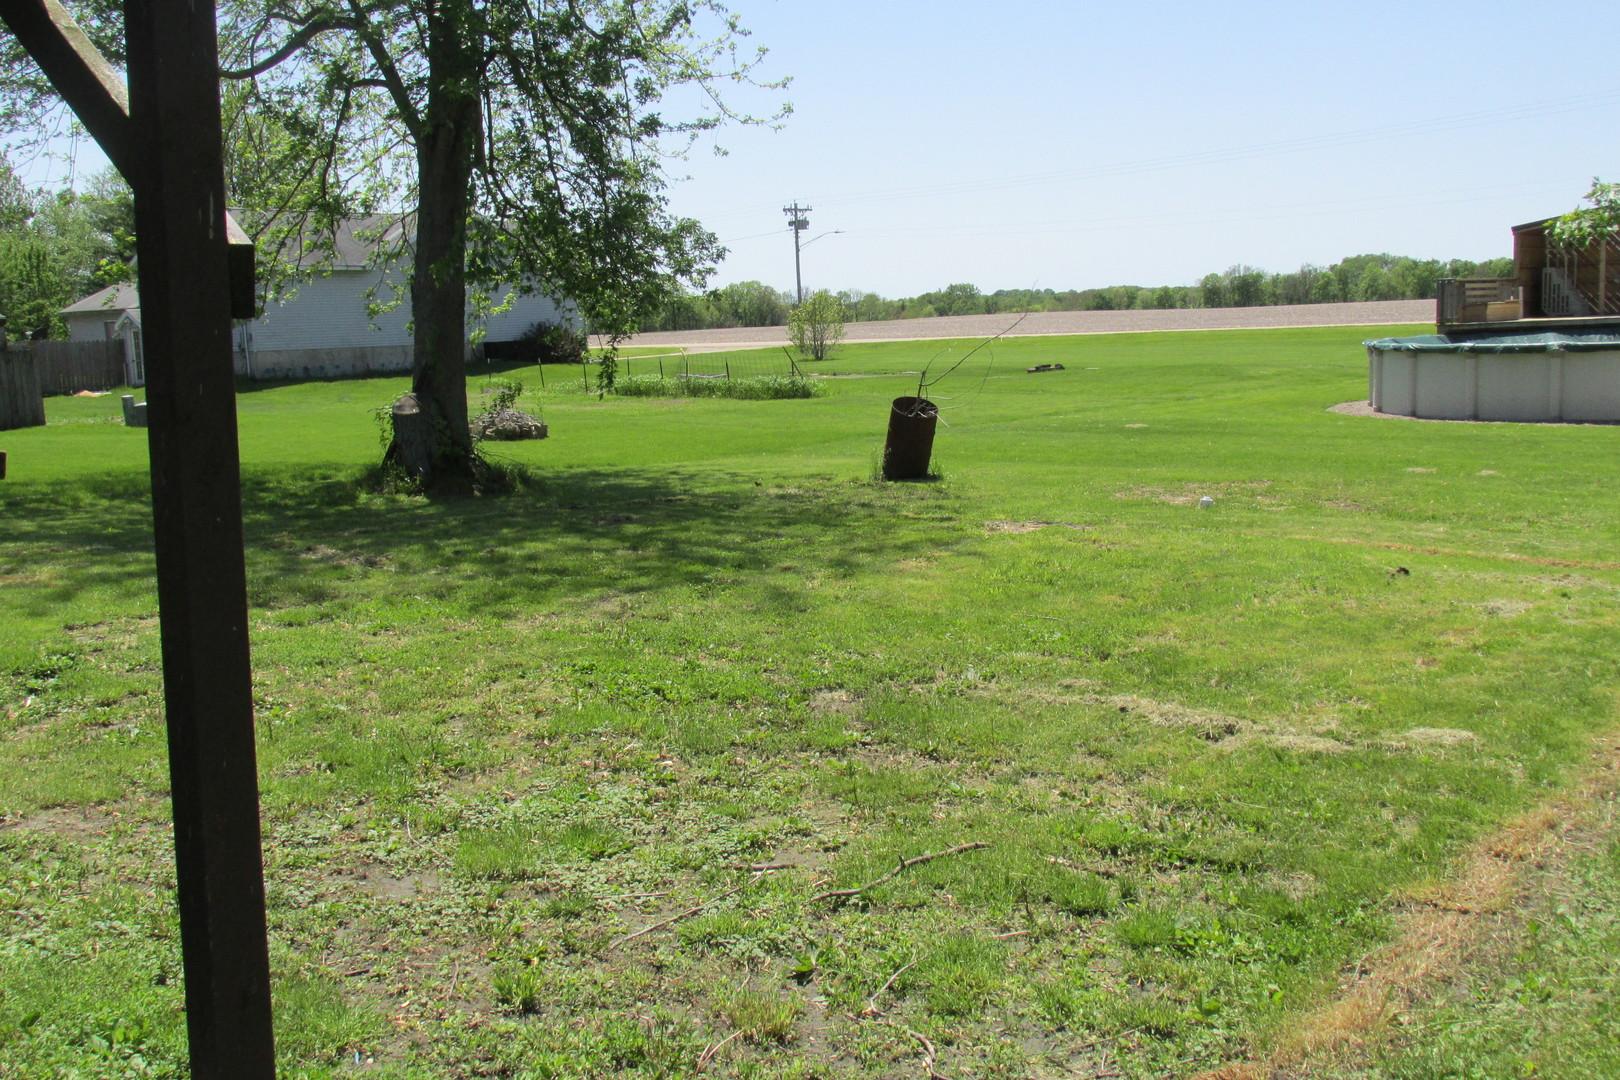 510 greencastle, WYANET, Illinois, 61379